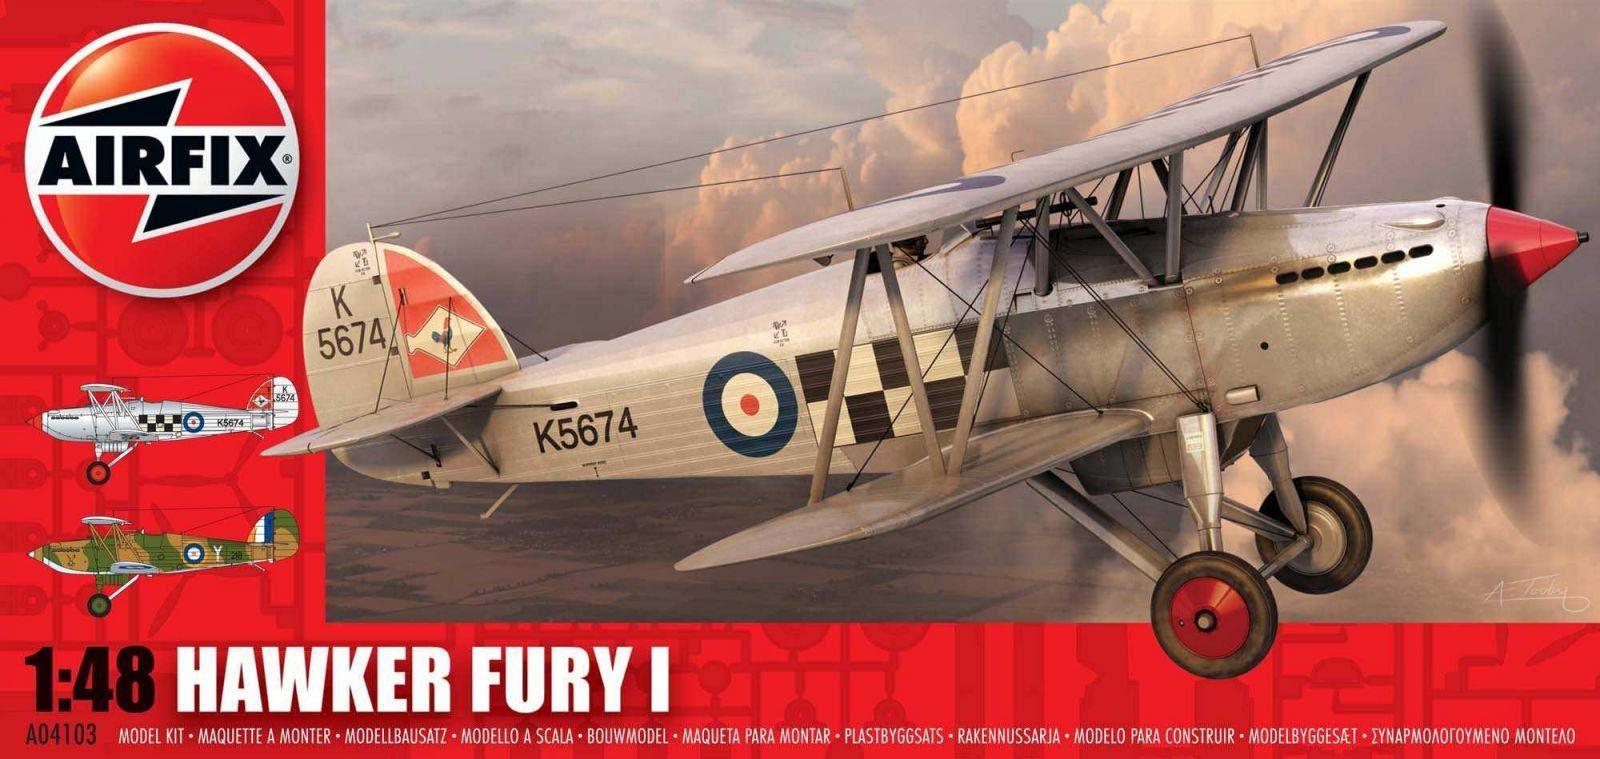 Hawker Fury I - 1/48 - Airfix A04103  - BLIMPS COMÉRCIO ELETRÔNICO